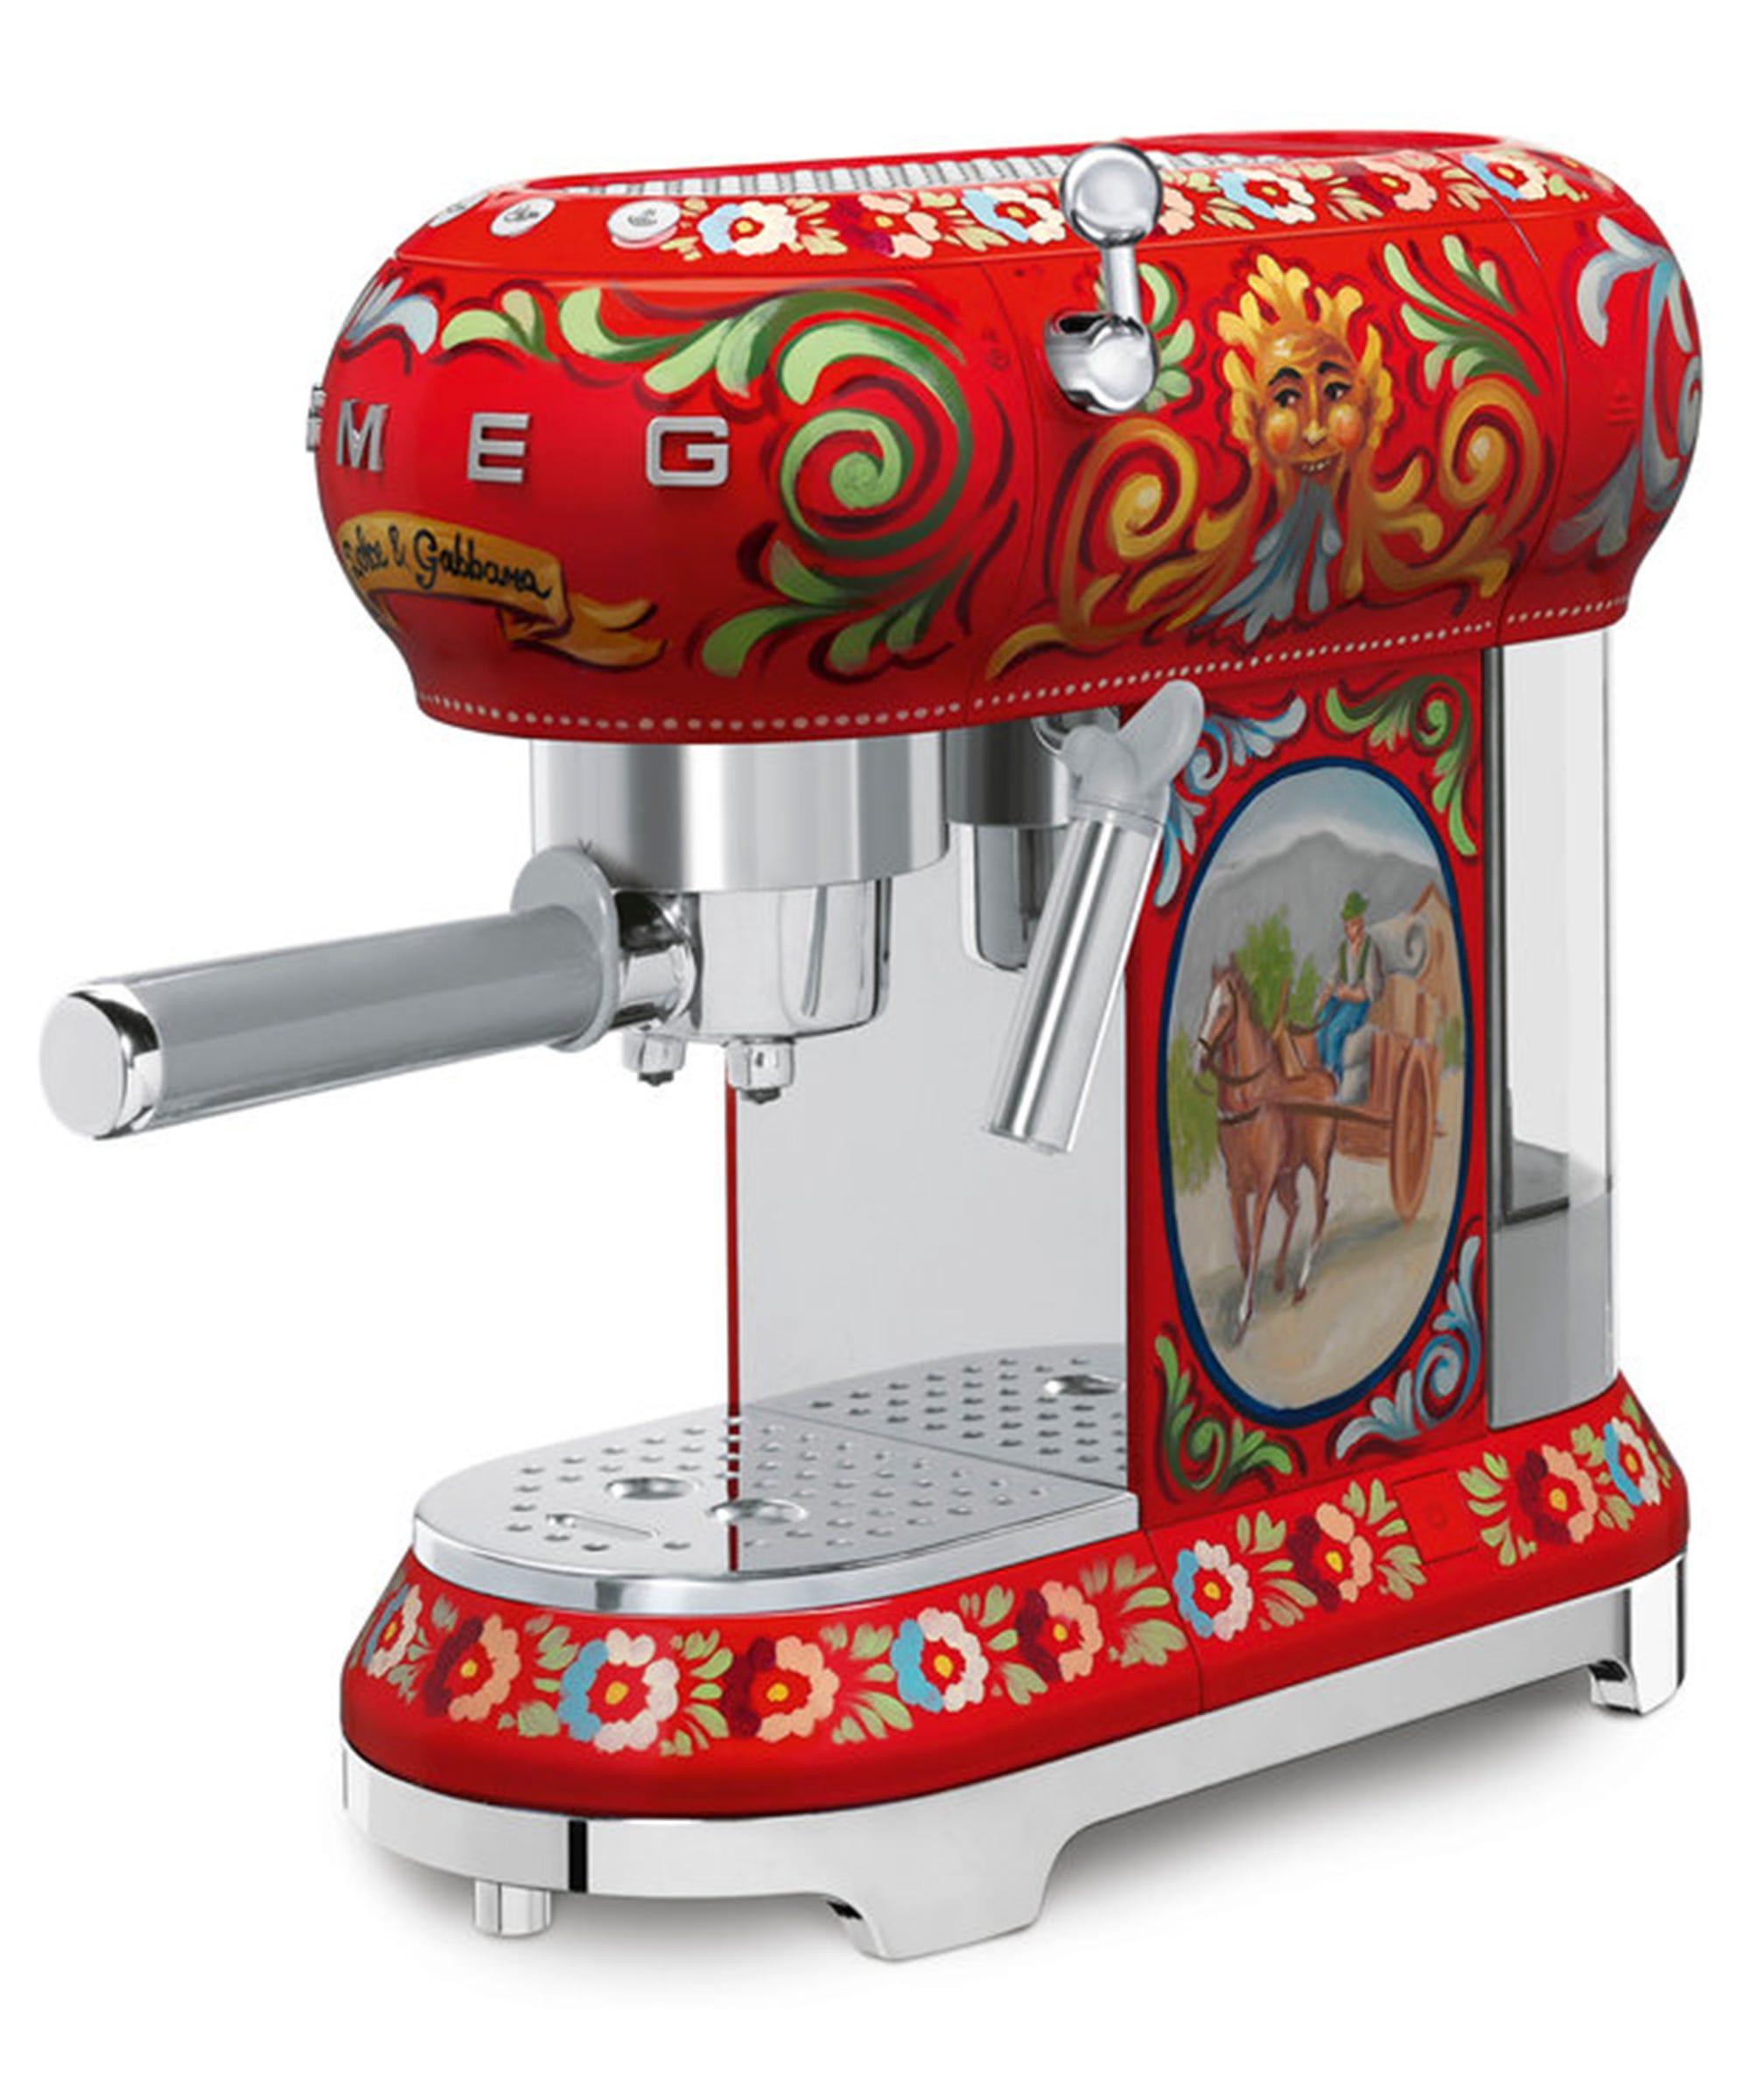 10c9612efc58 Dolce Gabbana Smeg Kitchen Appliance Collection Picture